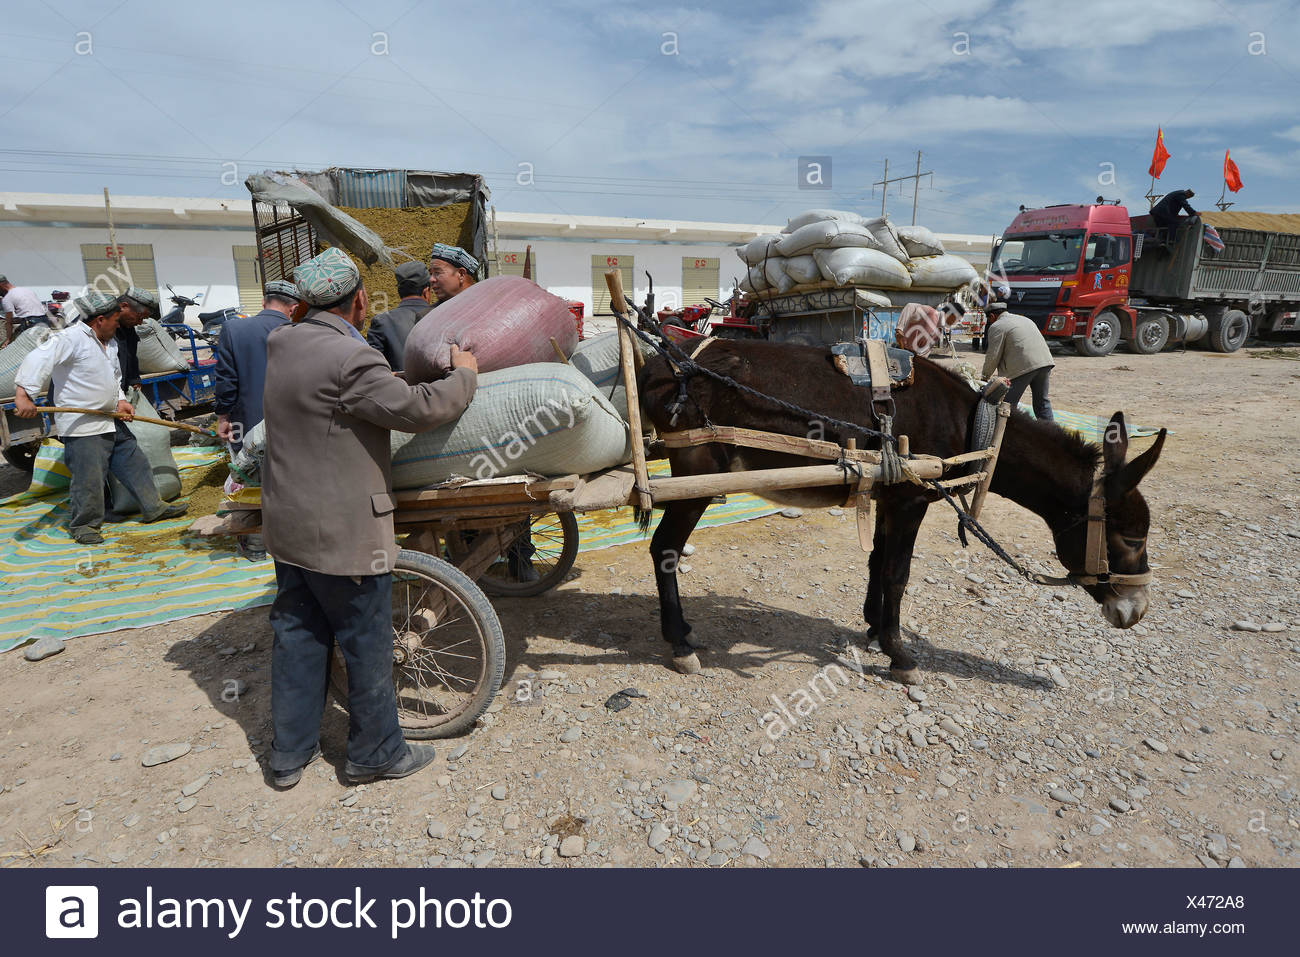 Muslim man, Uyghur with a cap loading his donkey cart with sacks of manure, fertiliser, Uyghur cattle market, Sunday market - Stock Image